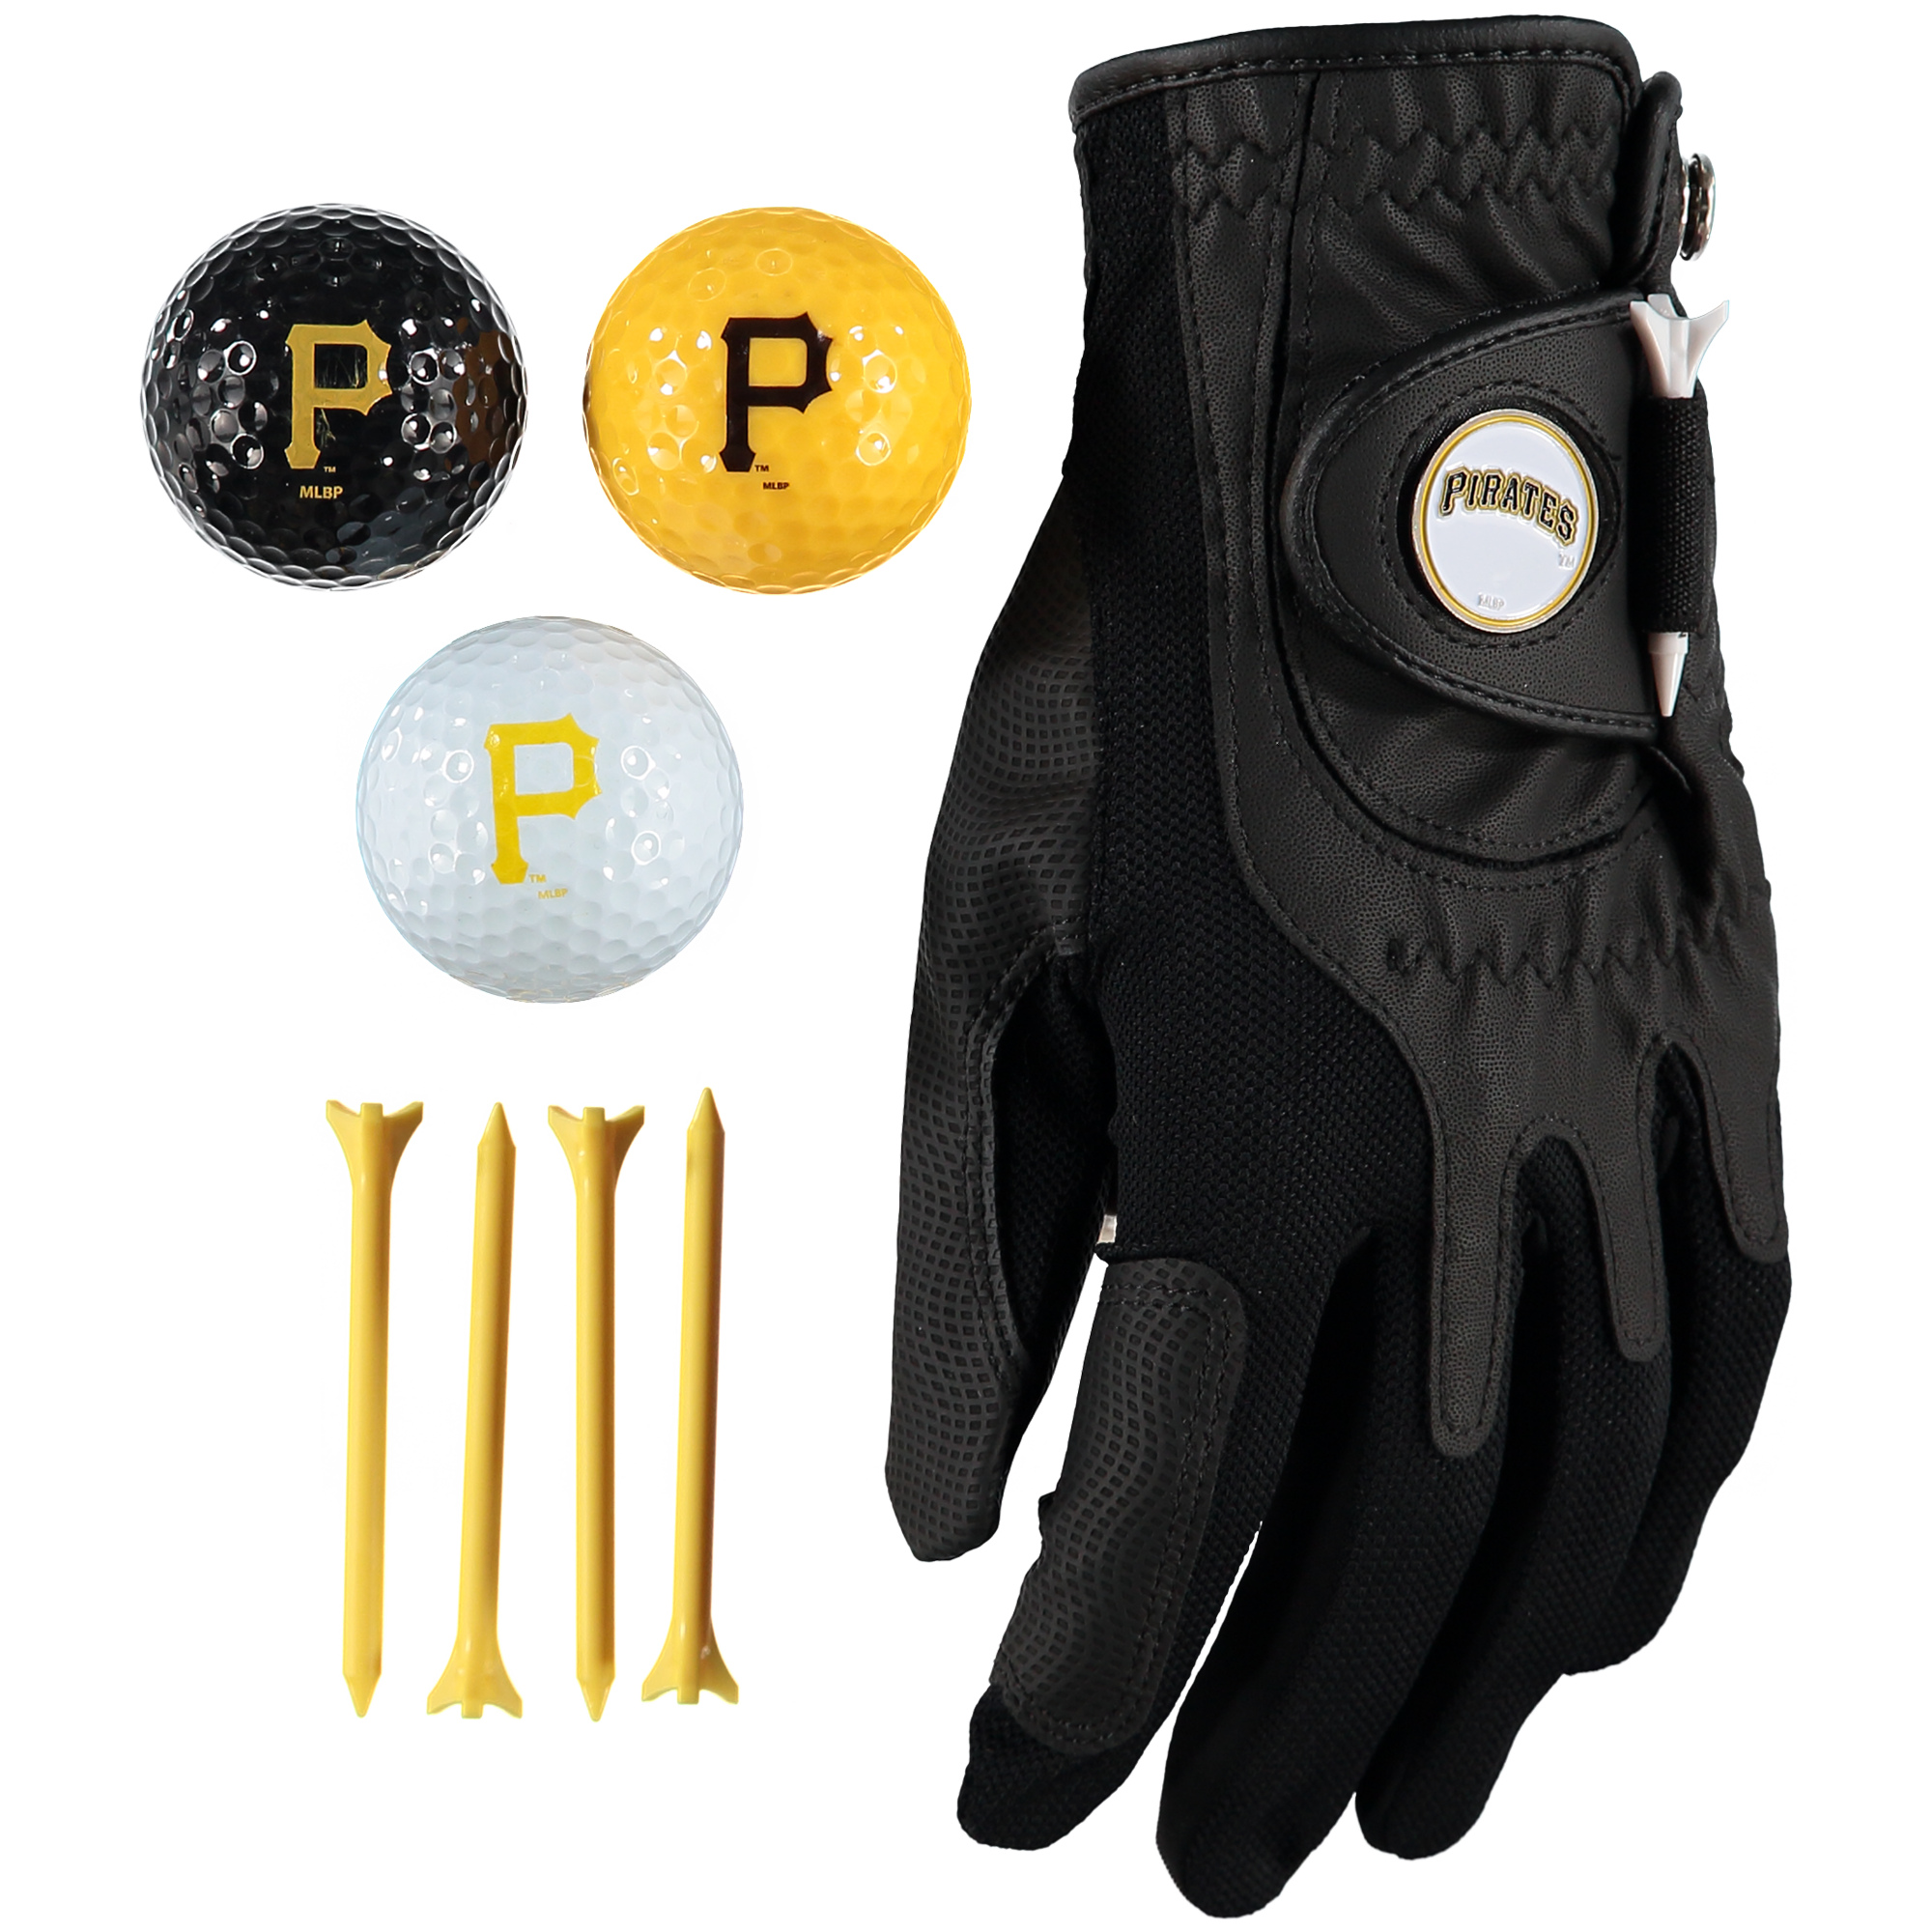 Pittsburgh Pirates Golf Balls, Tees & Glove Set - No Size